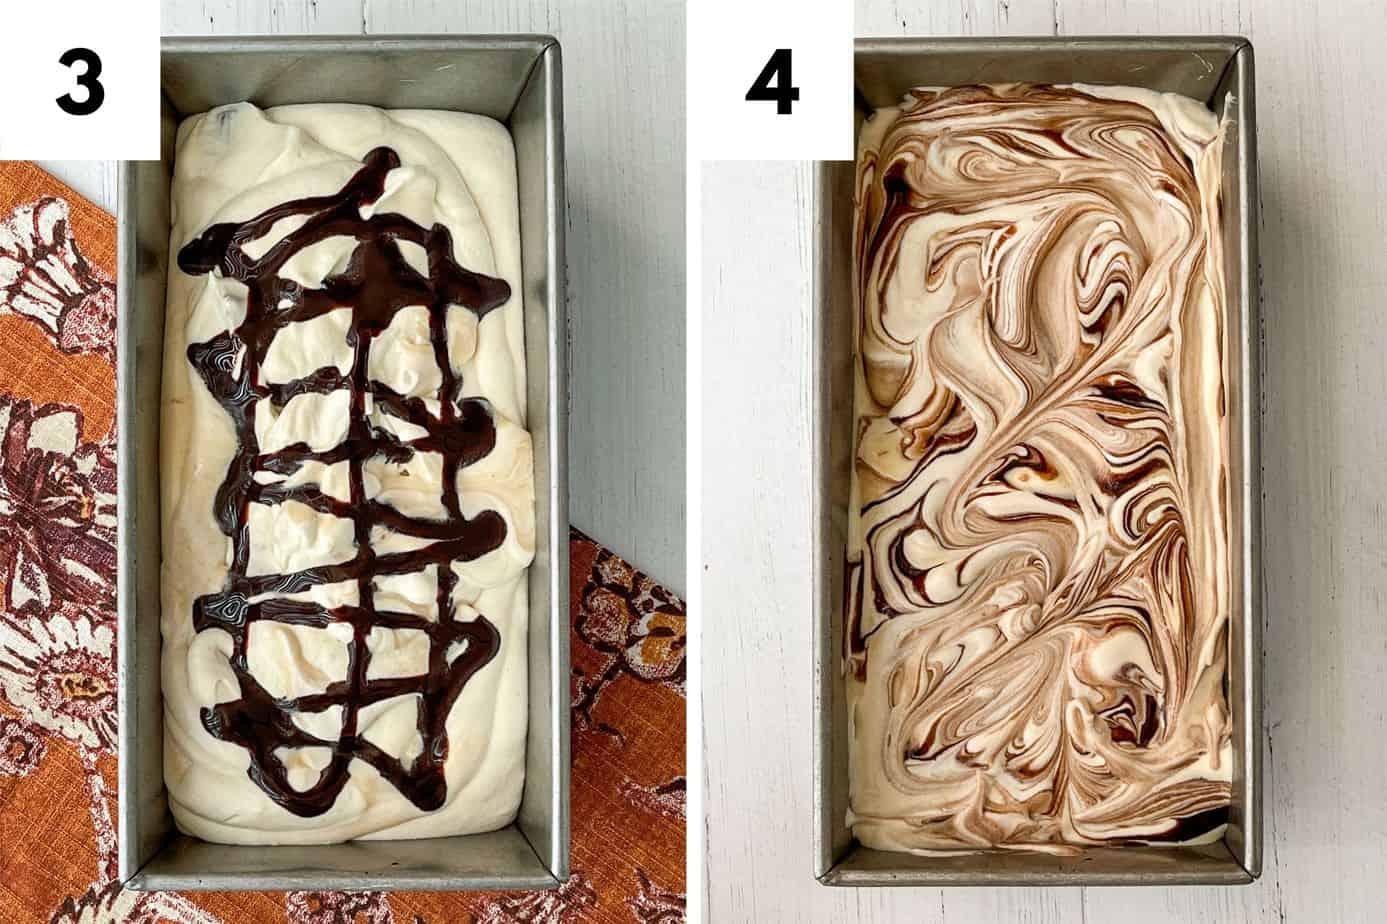 Preparing the No Churn Peanut Butter Chocolate Ice Cream for Freezing